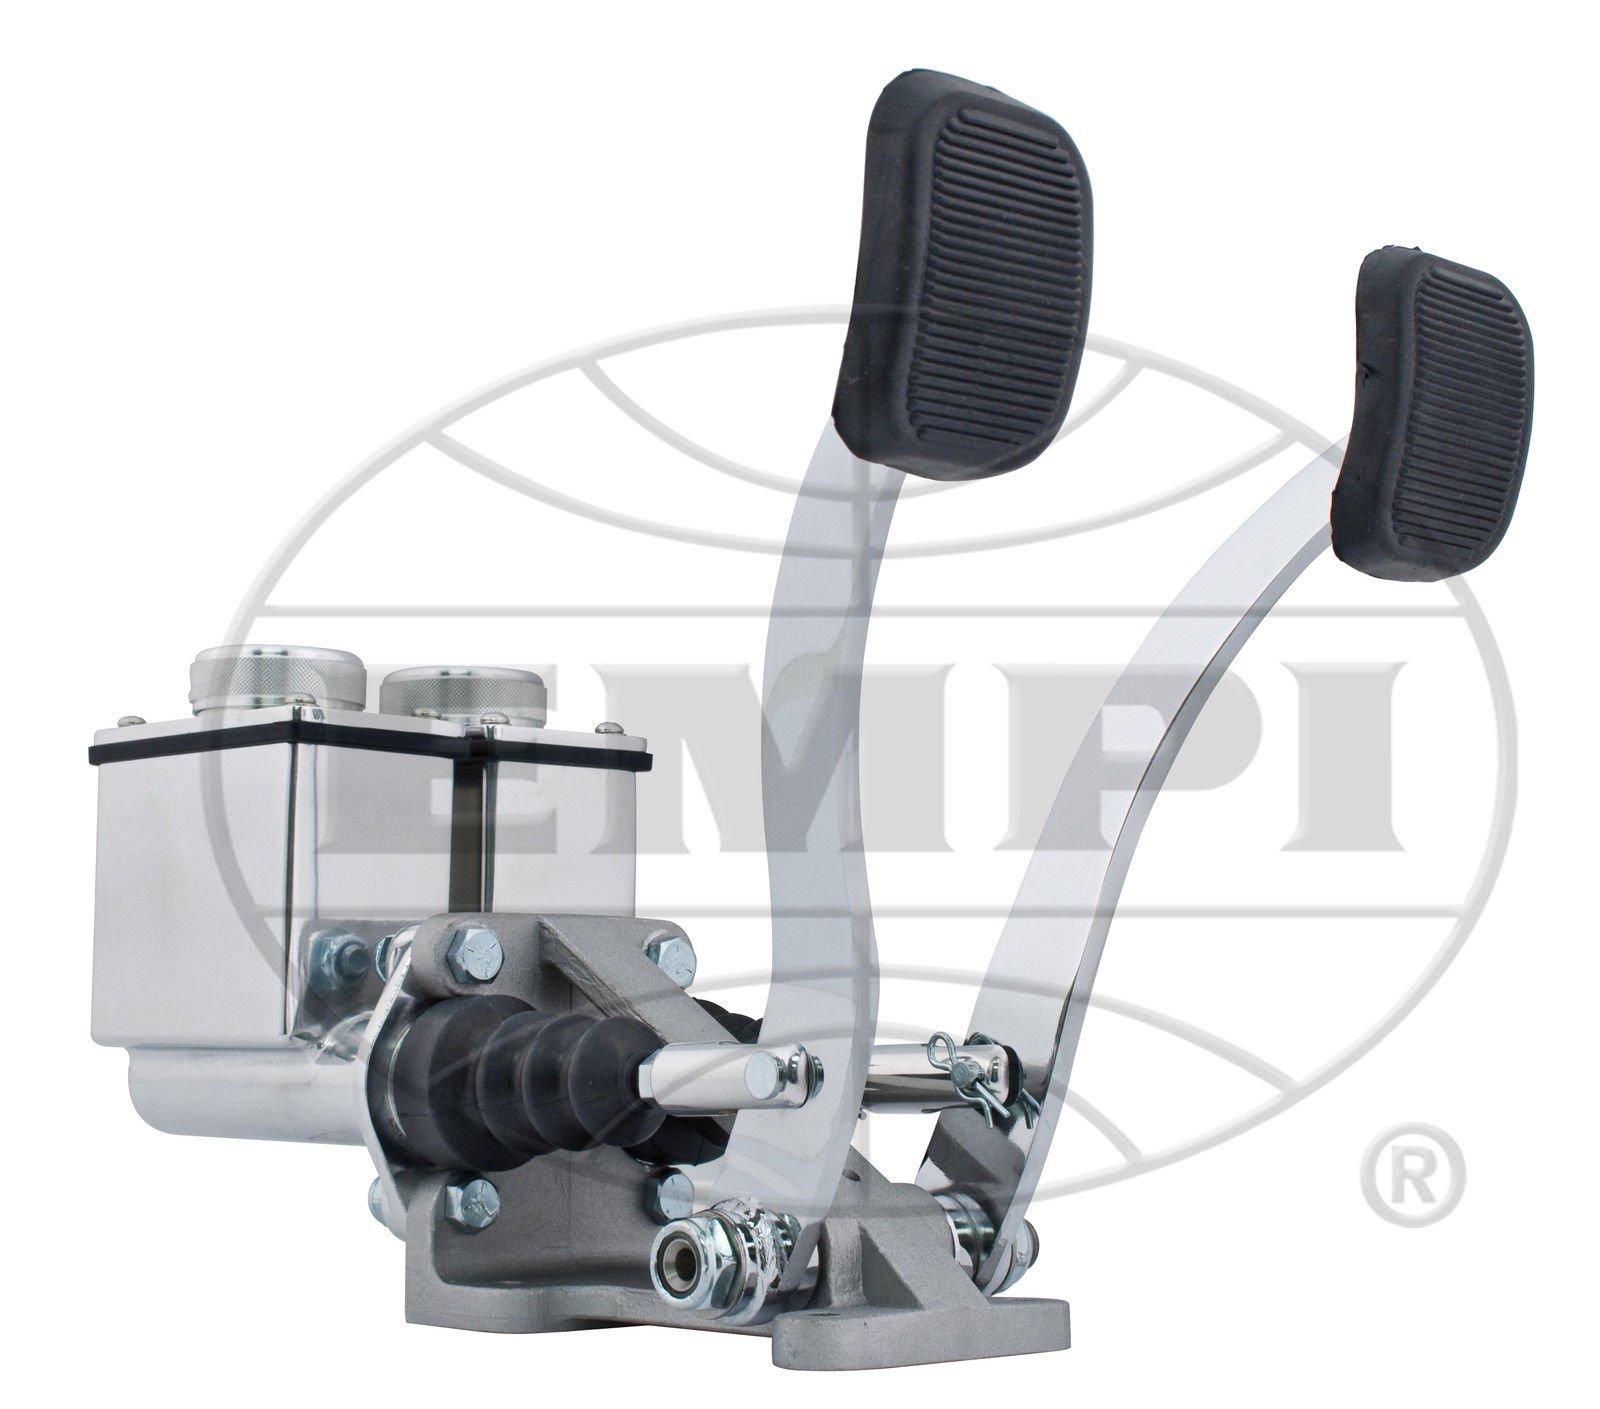 EMPI 16-2530-0 RACE TRIM Dual Pedal Assembly, 3/4'' Clutch - 7/8'' Brake, Polished